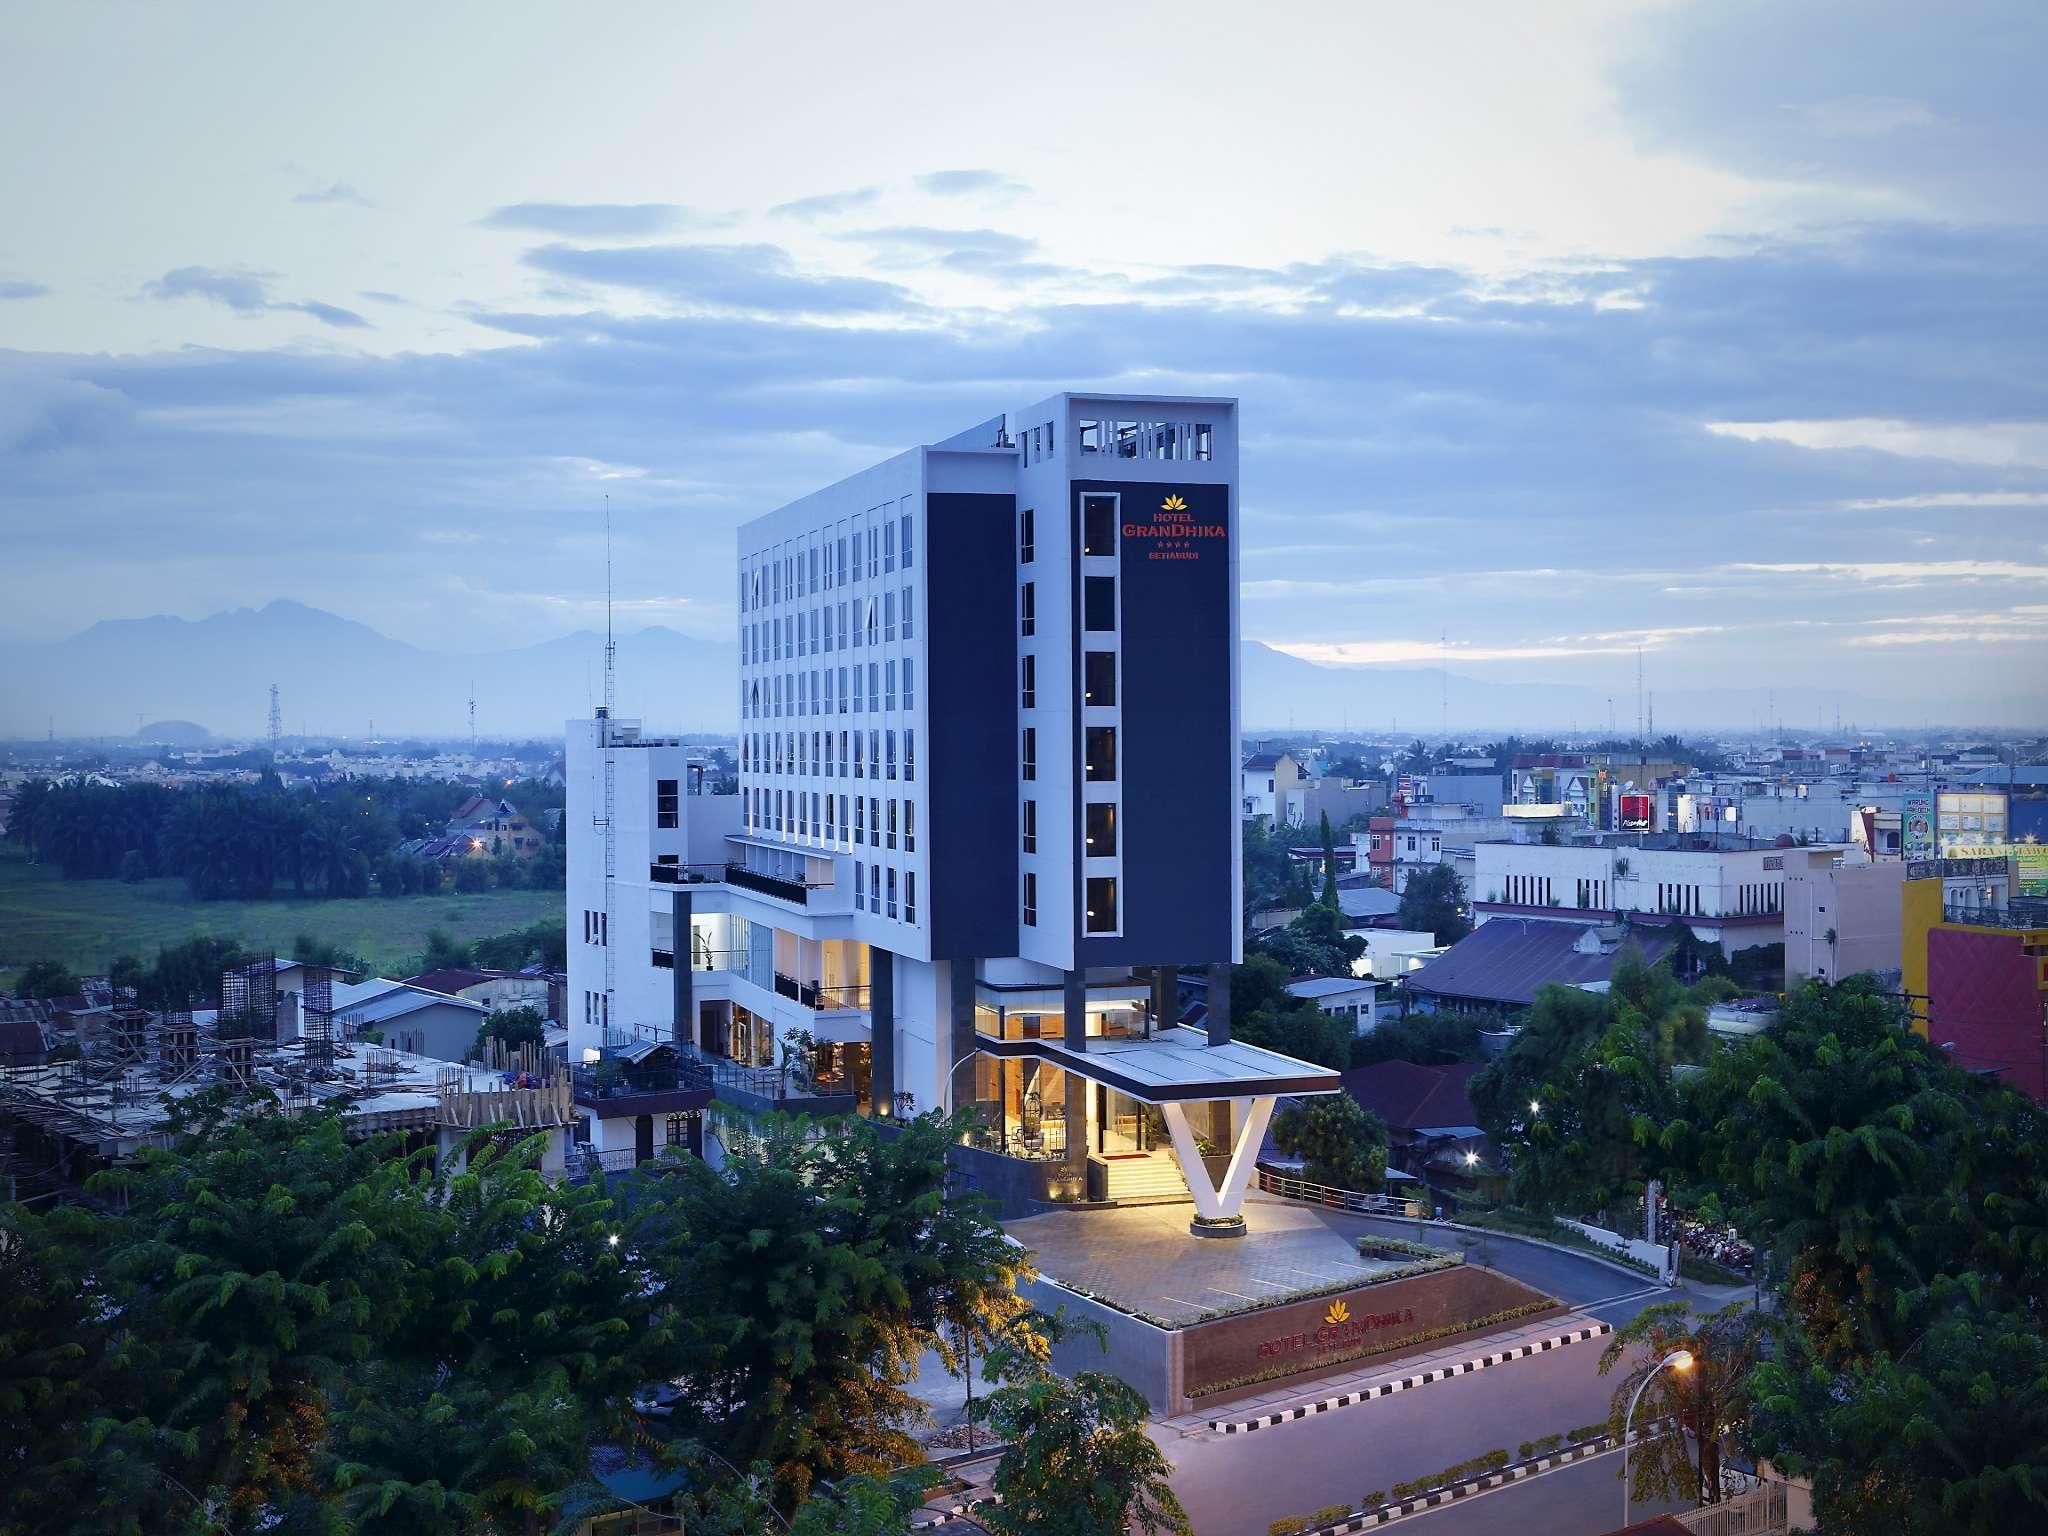 Medan Hotels, Indonesia: Great savings and real reviews